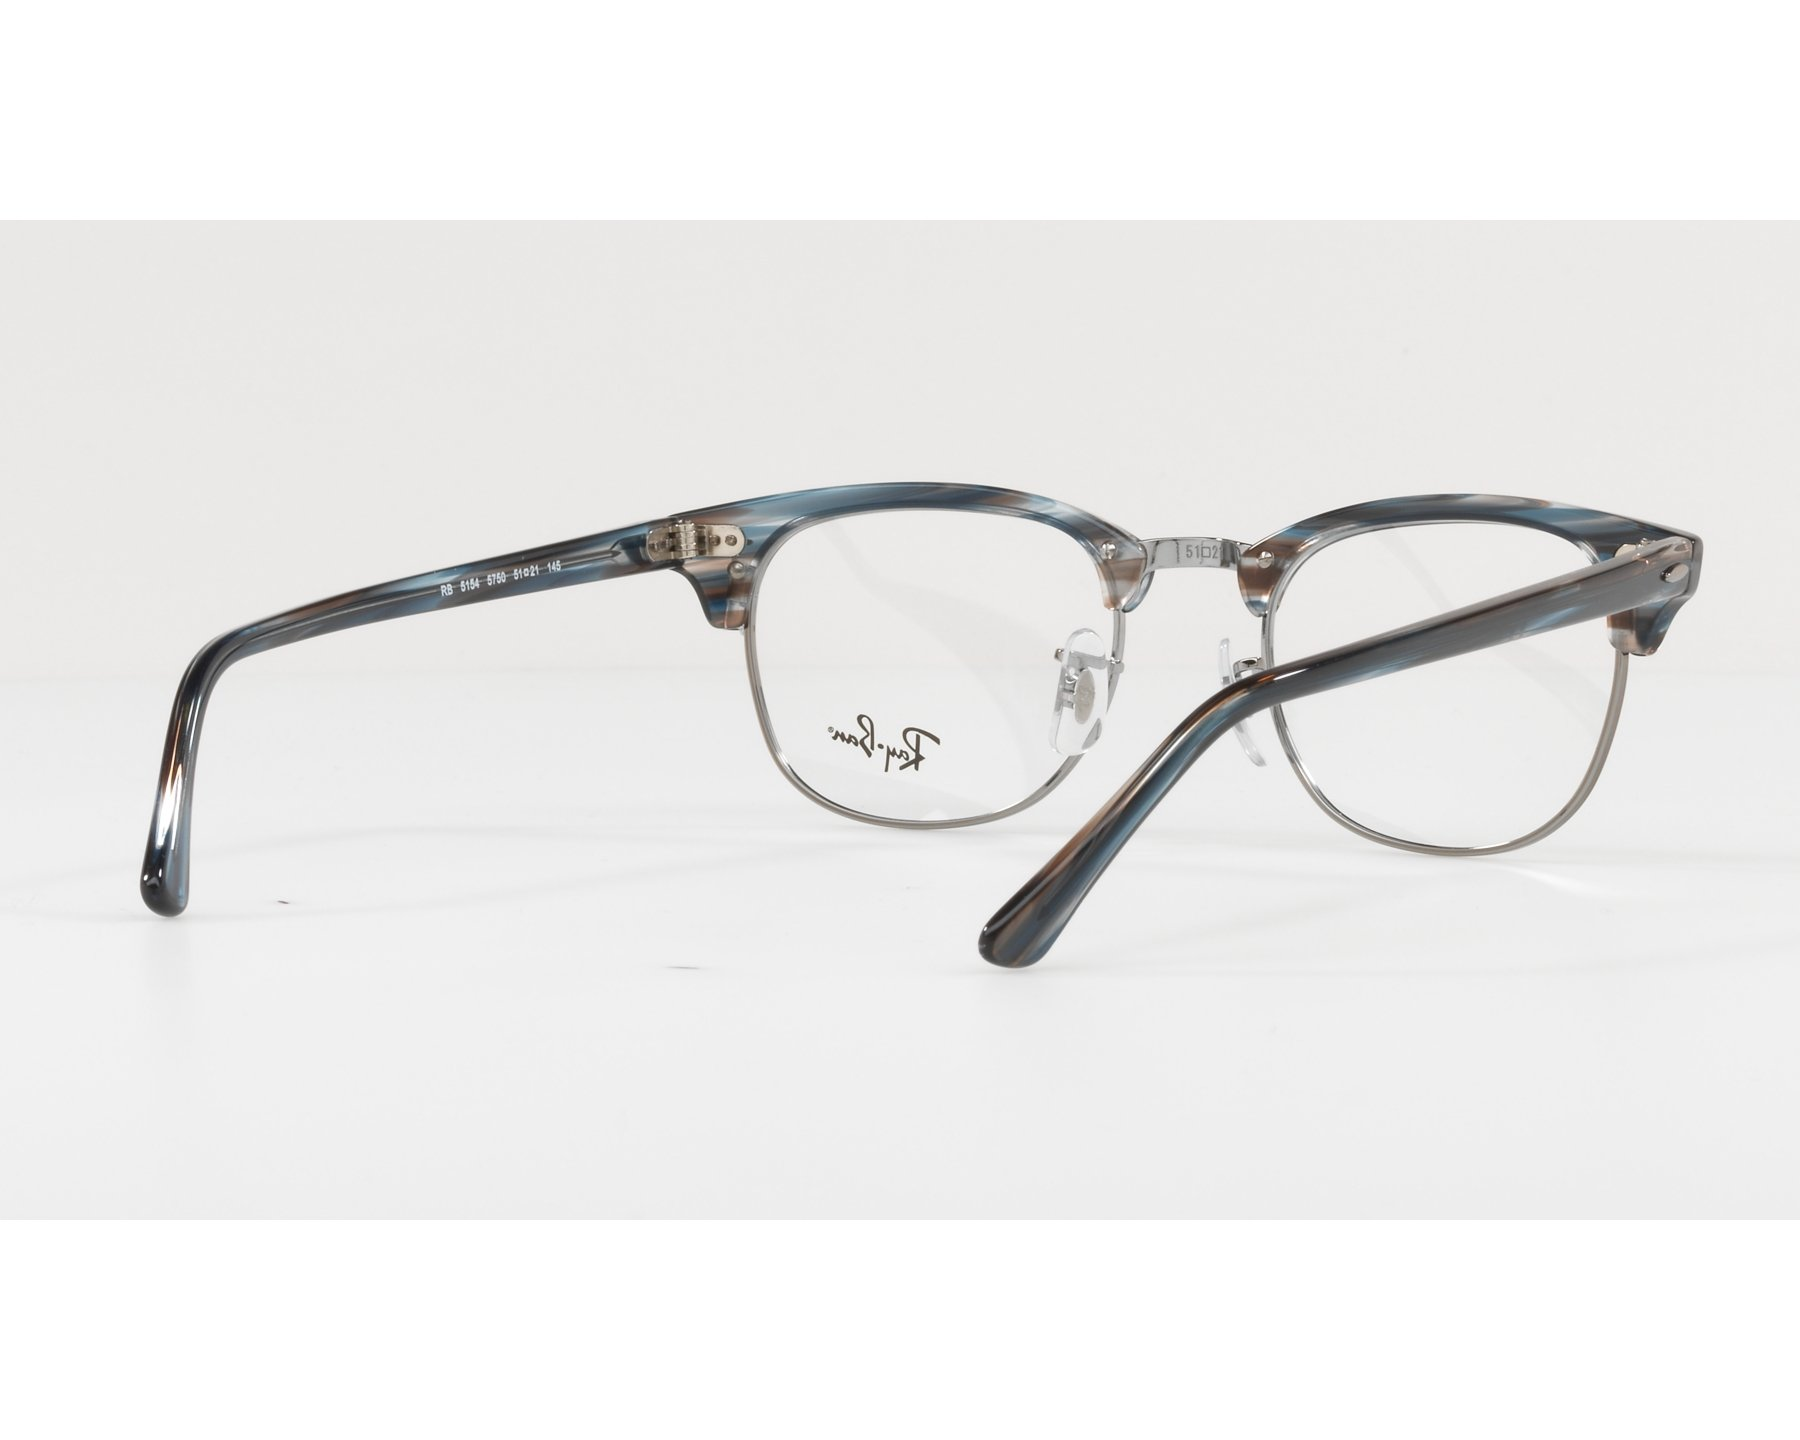 8e64e28e9a8 eyeglasses Ray-Ban RX-5154 5750 49-21 Green Gun 360 degree view